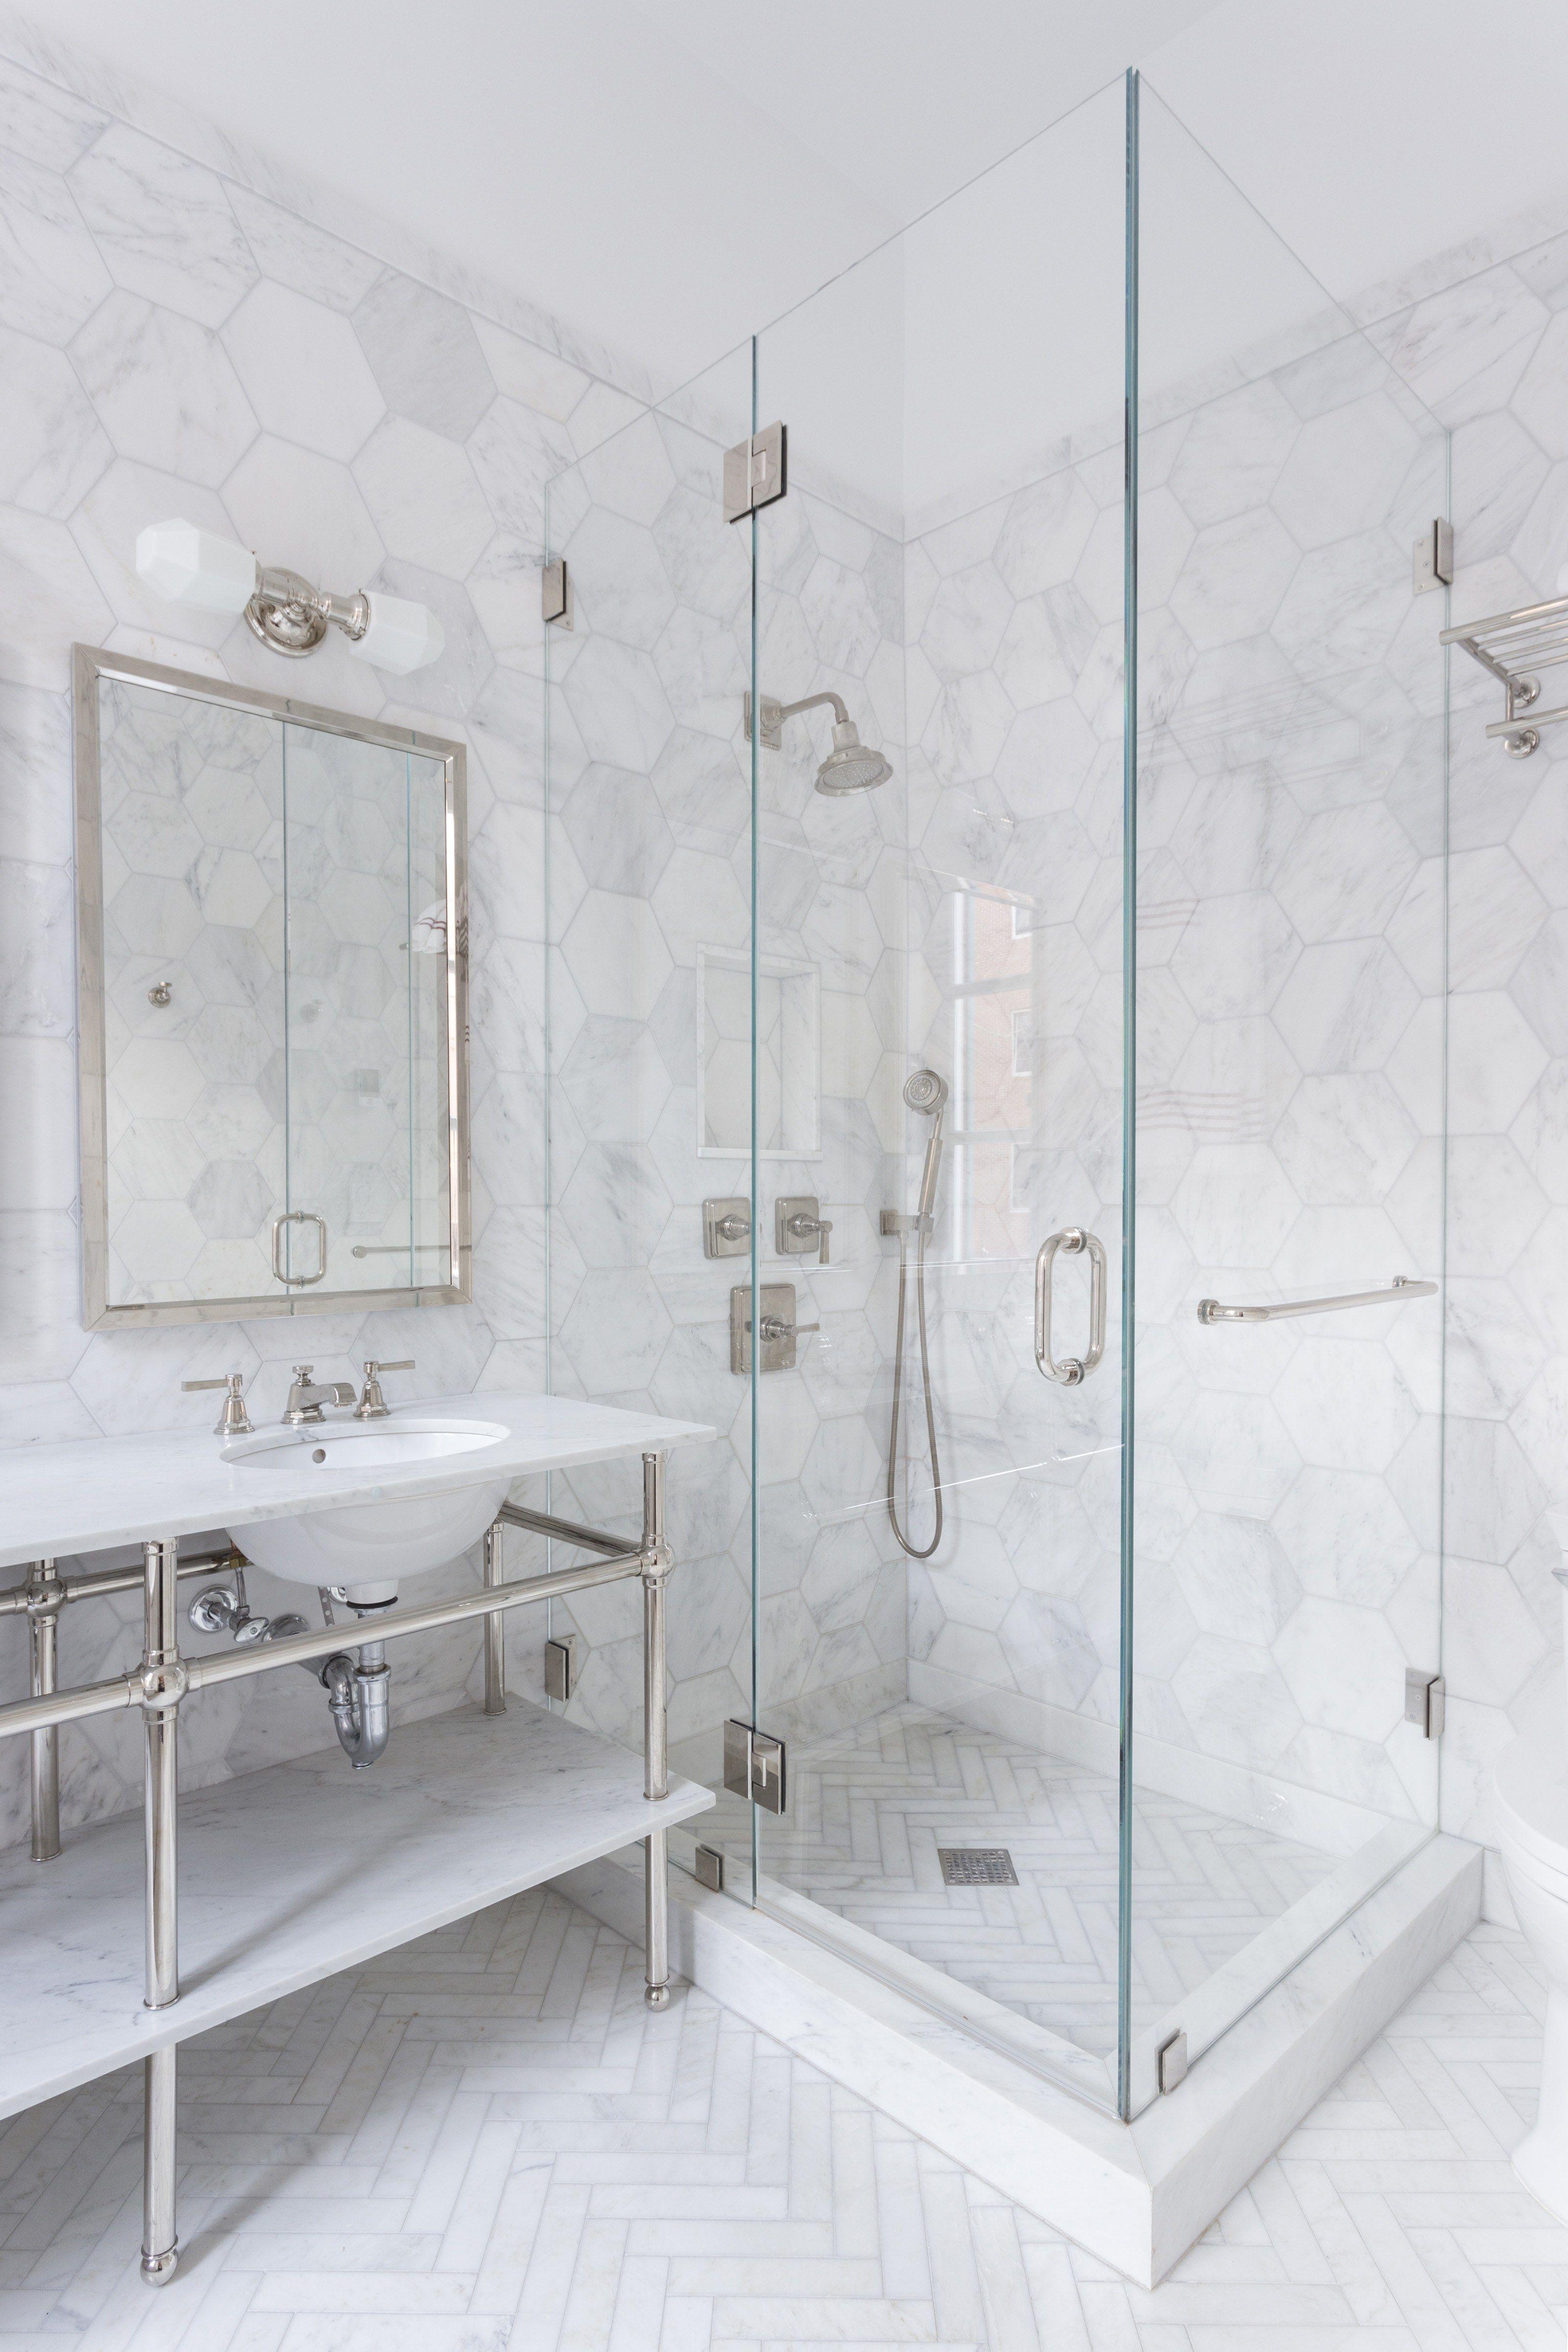 A New York City Couple Remodels Their Small Bath Marble Bathroom Designs Marble Tile Bathroom Shower Floor